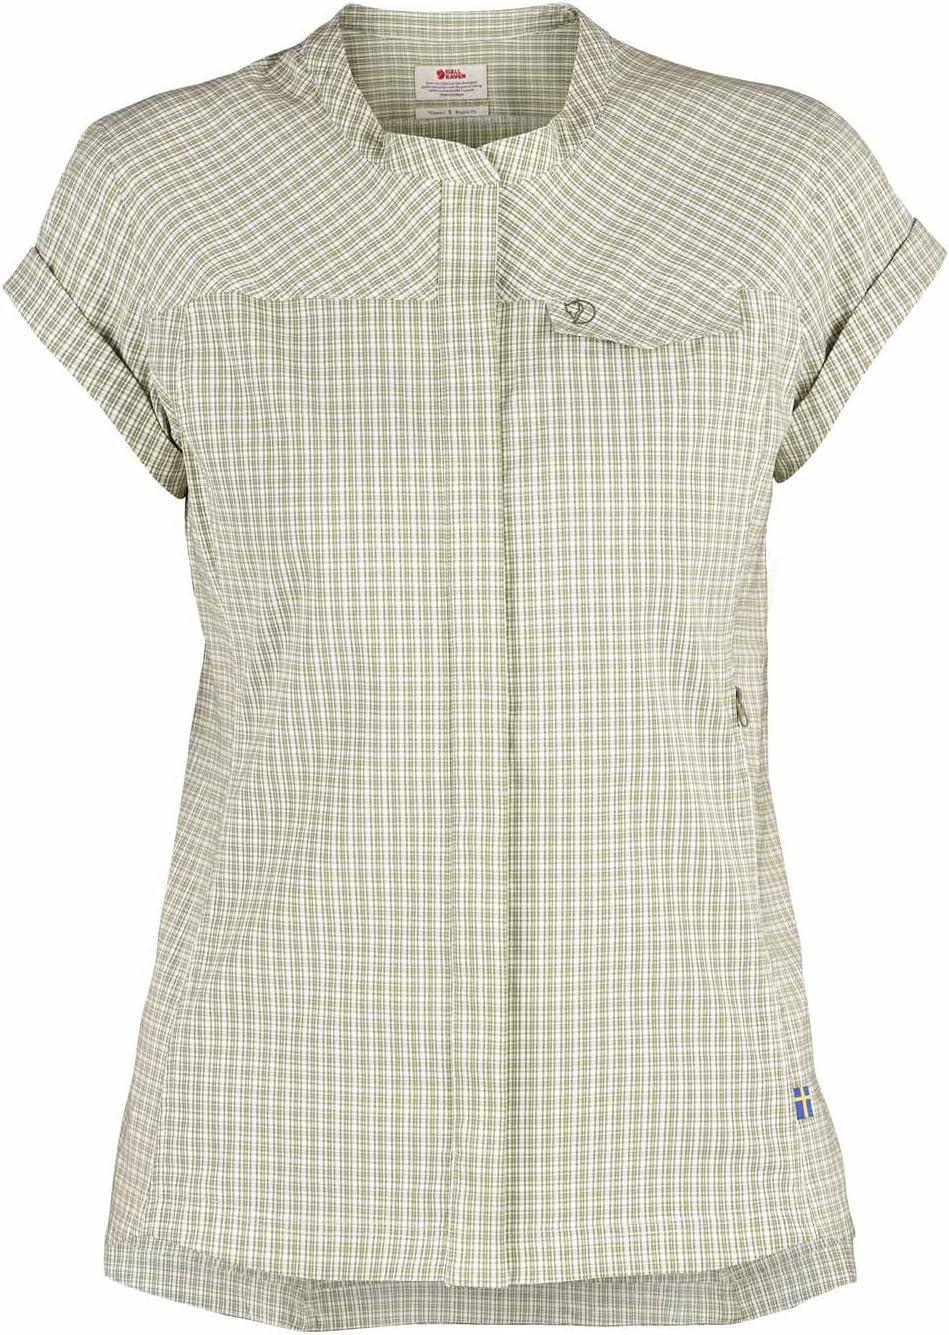 FJ/ÄLLR/ÄVEN 89822/Shirt